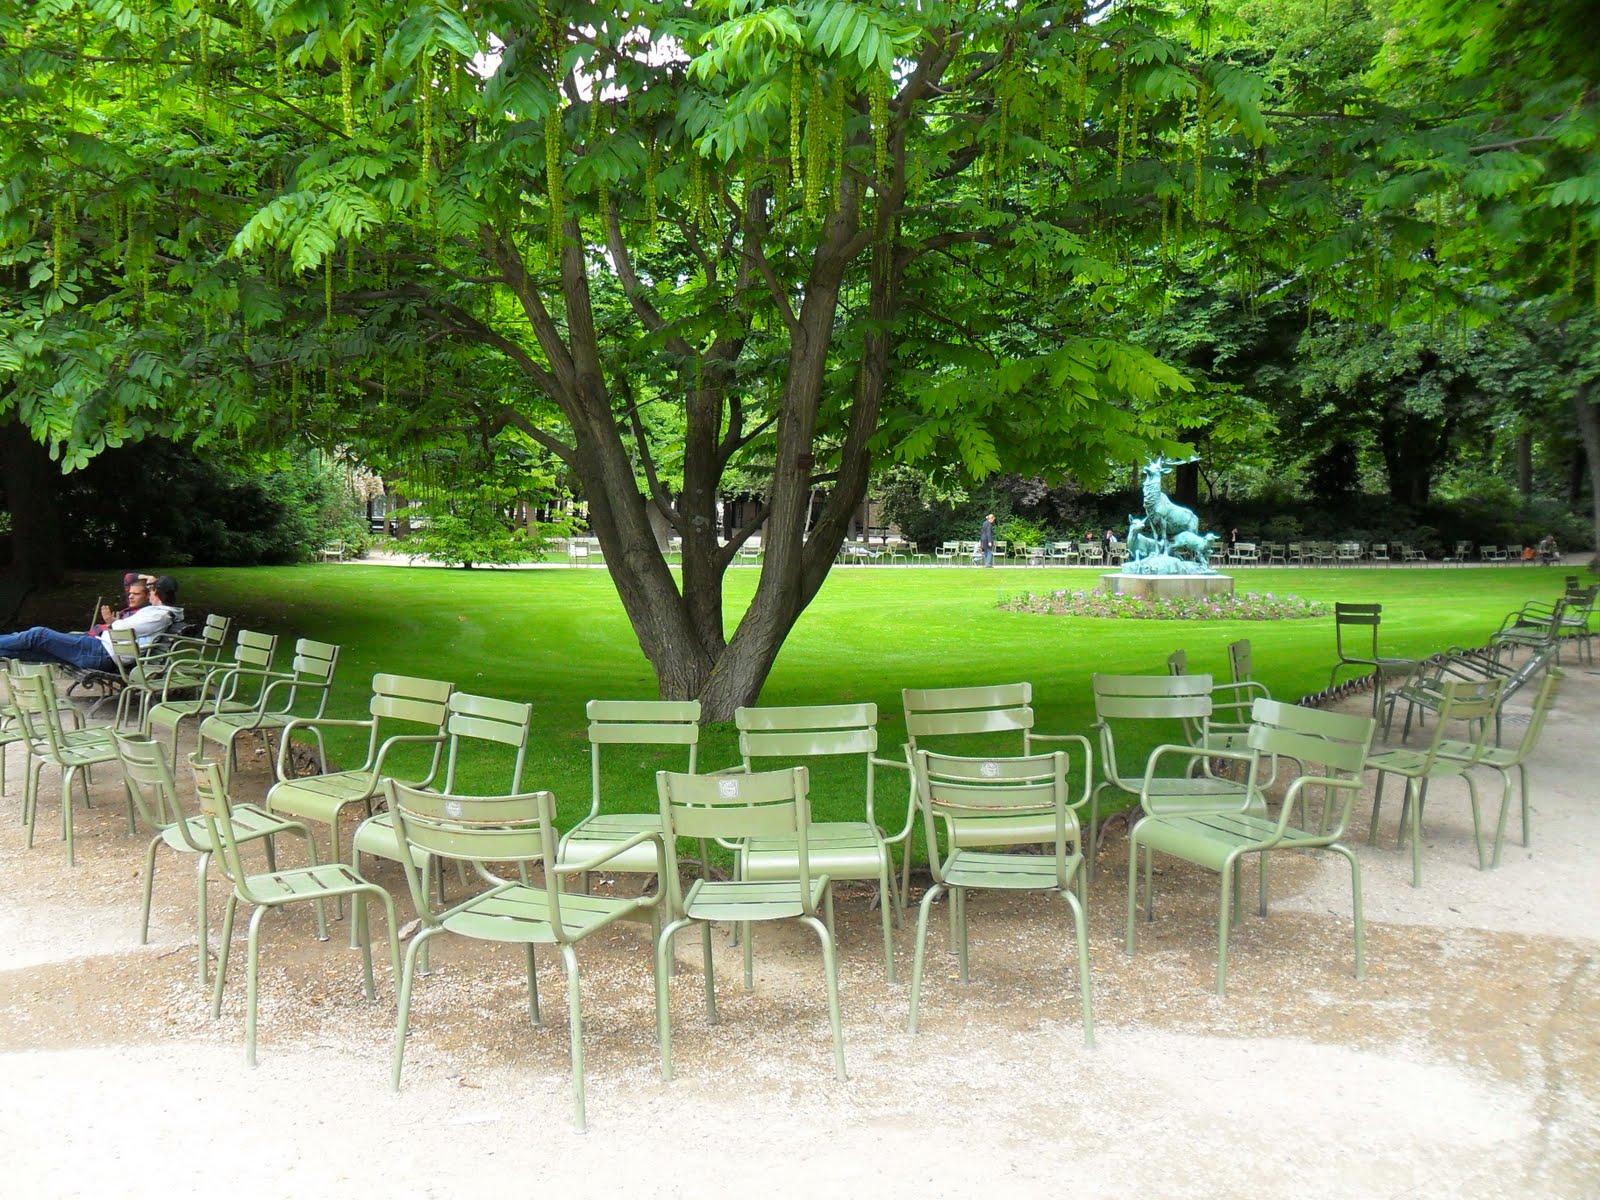 vive la france zietroen With fermob jardin du luxembourg 5 vive la france zietroen